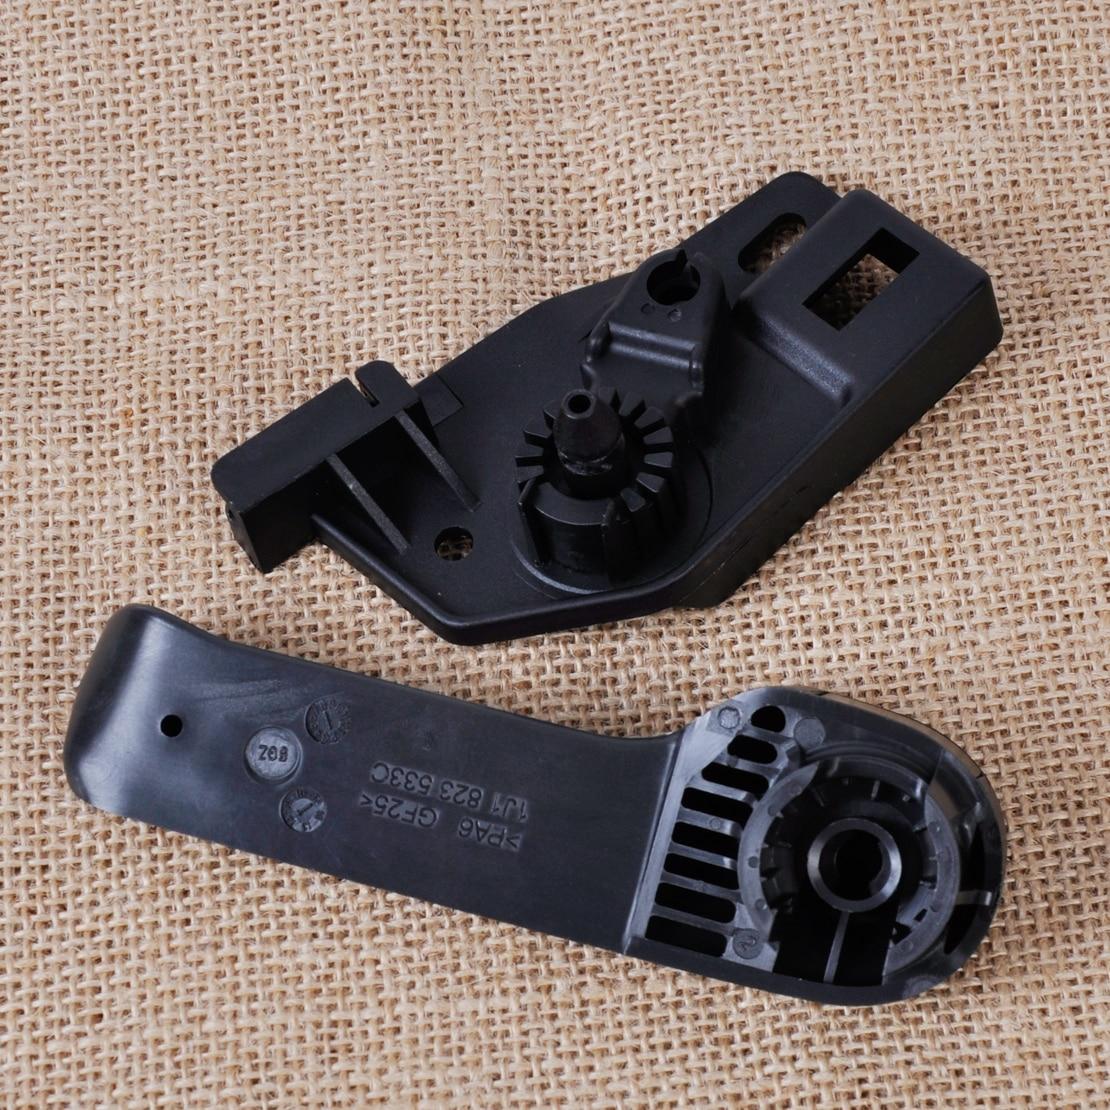 ¡Nuevo! pestillo negro beler + soporte para VW Jetta Golf Beetle para Skoda Fabia Octavia 1J1823633A 1J1823533C